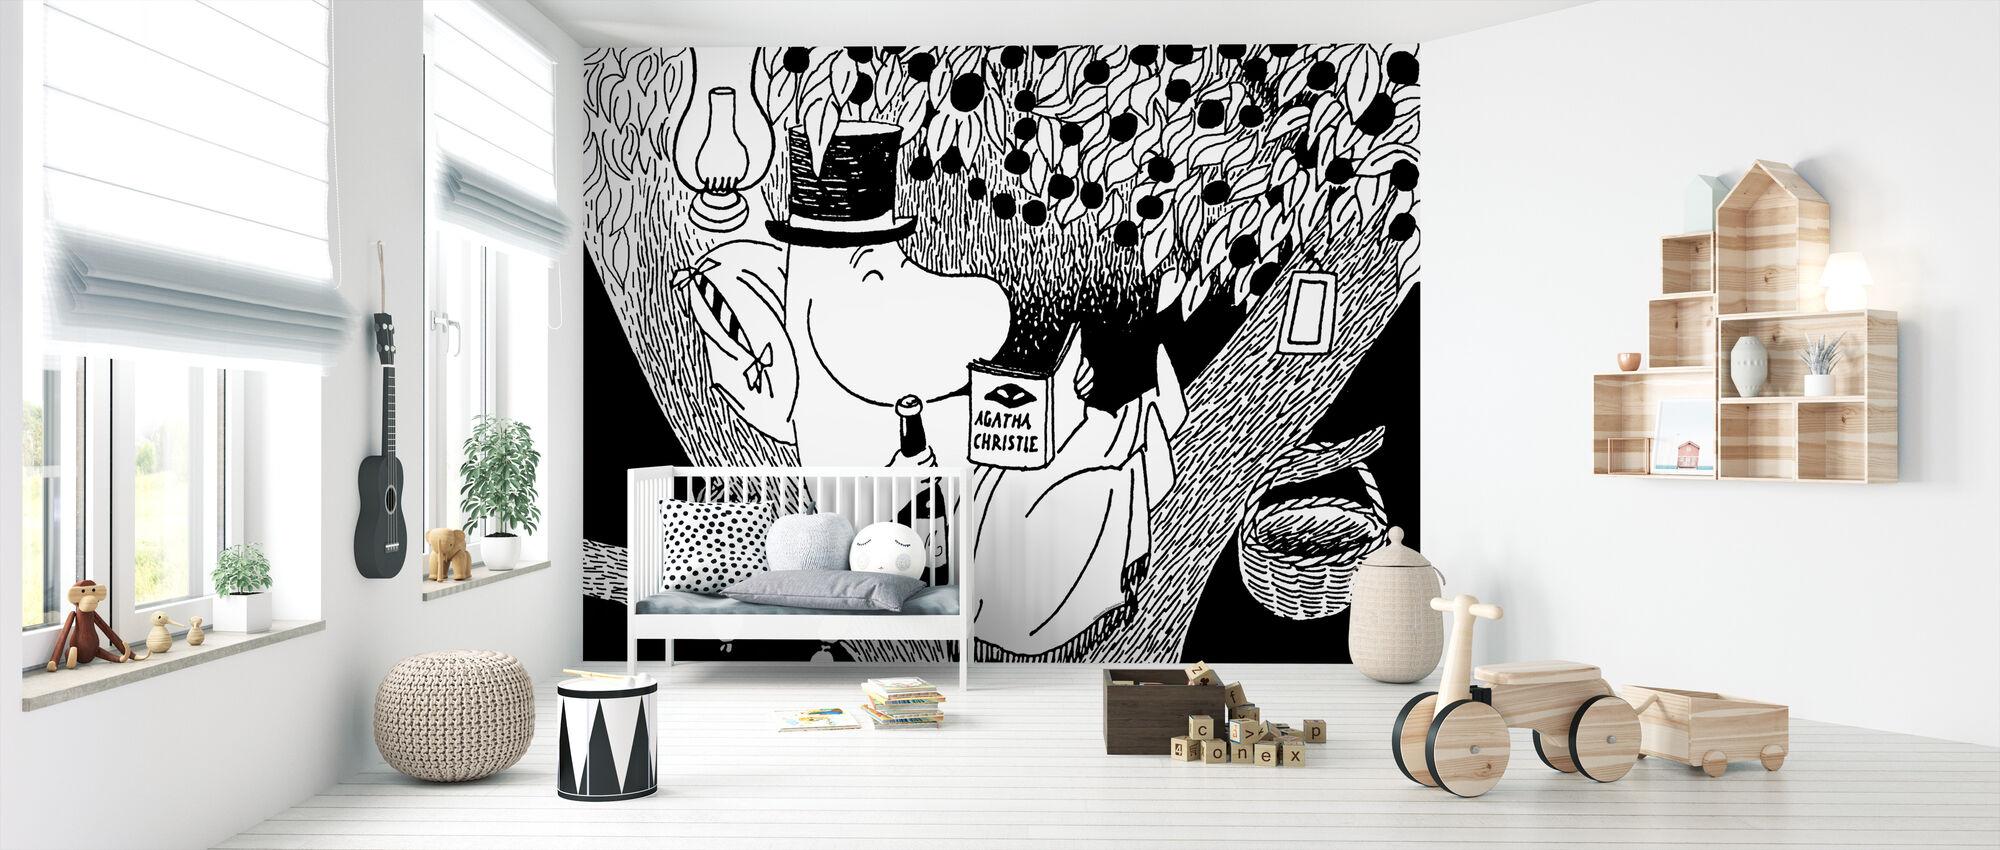 Moomin - Moominpappa Reading in a Tree - Wallpaper - Nursery